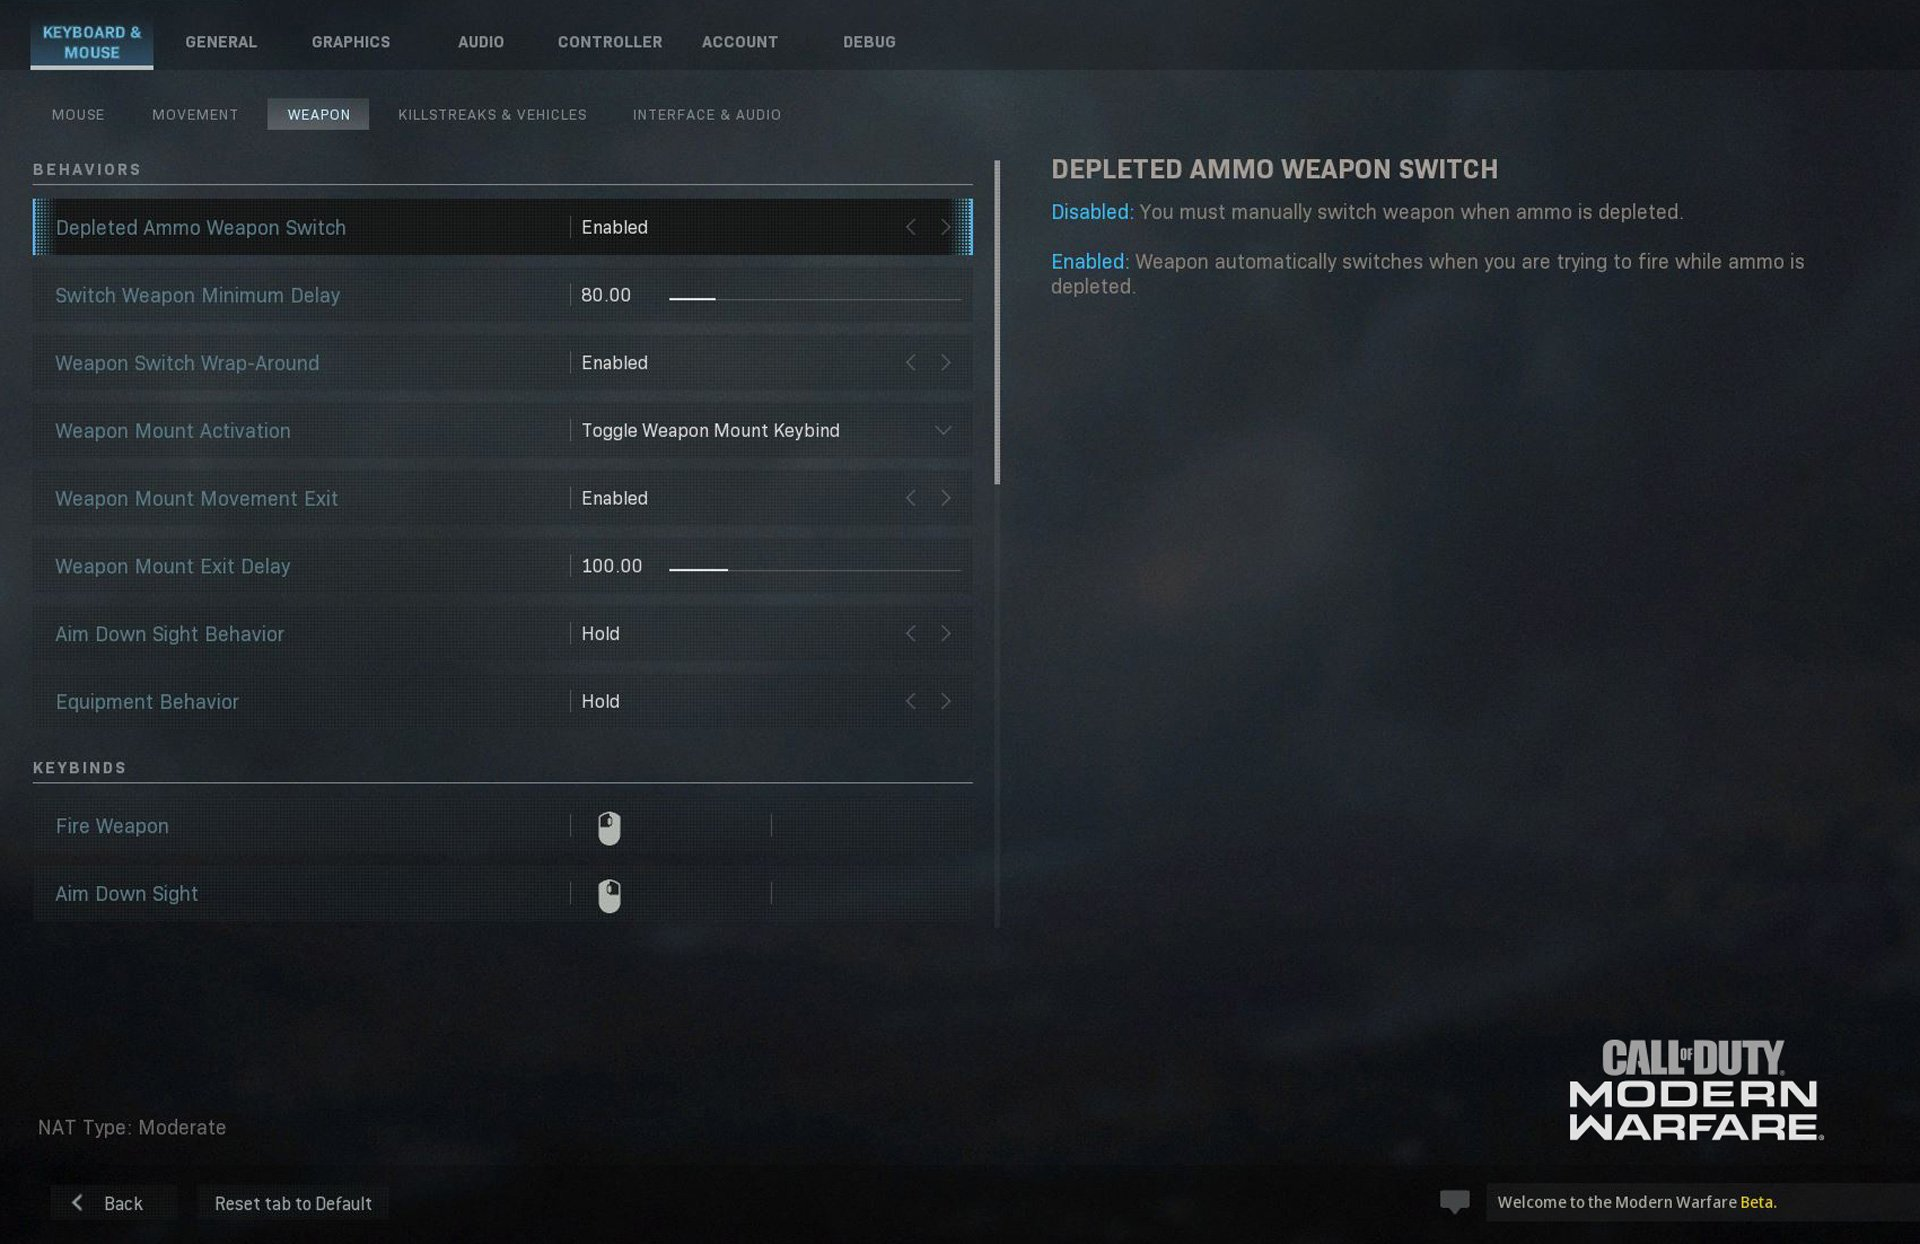 The Best Call of Duty: Modern Warfare Beta Settings